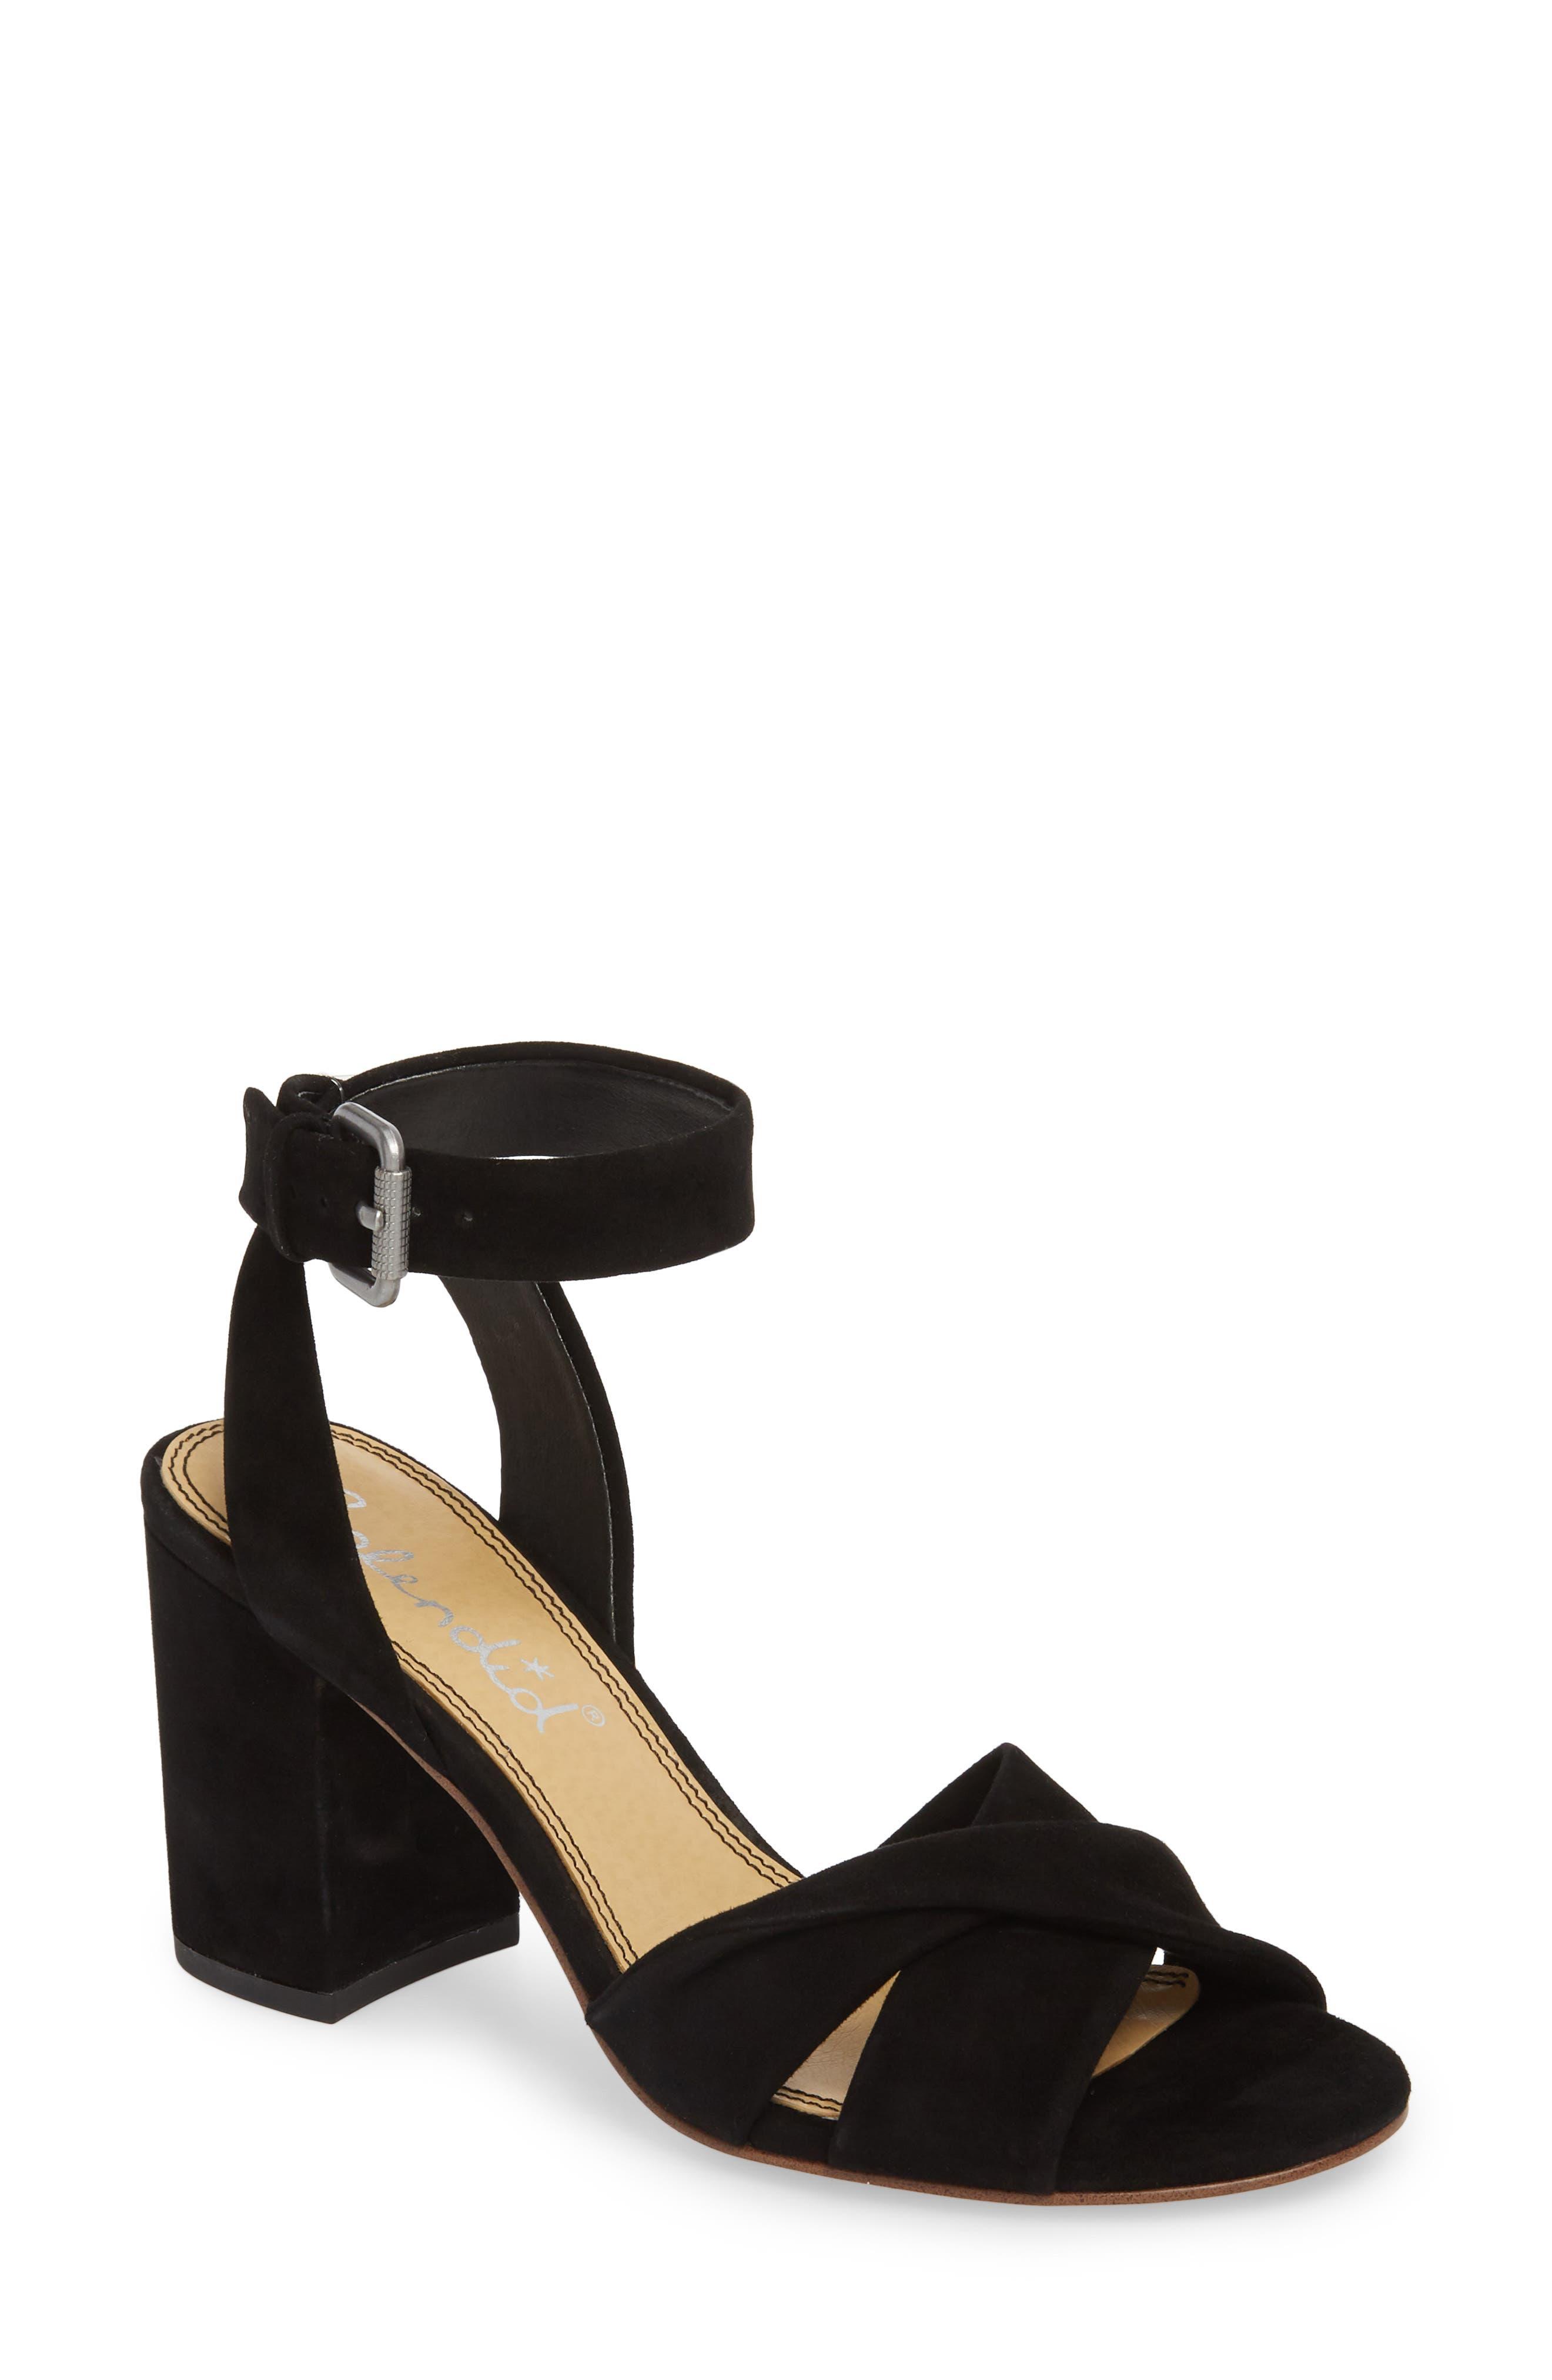 Fairy Block Heel Sandal,                             Main thumbnail 1, color,                             Black Suede